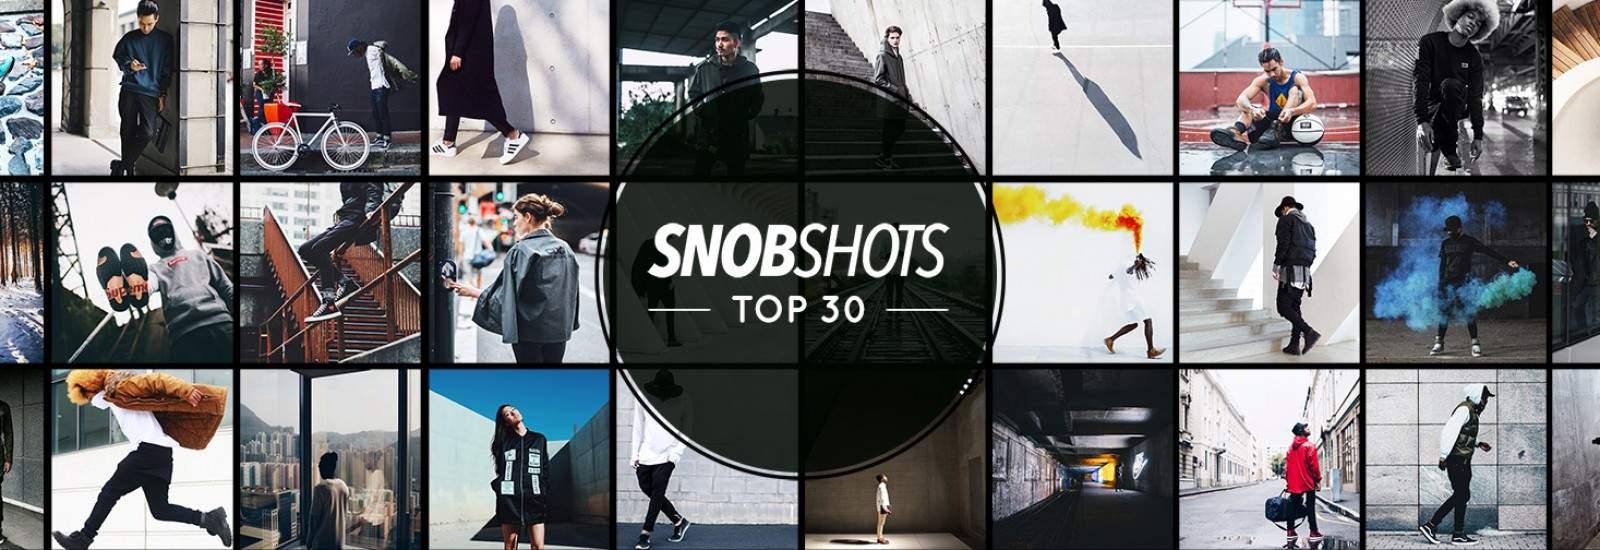 top 30 SNOBSHOTS STREETSTYLE_BLOG